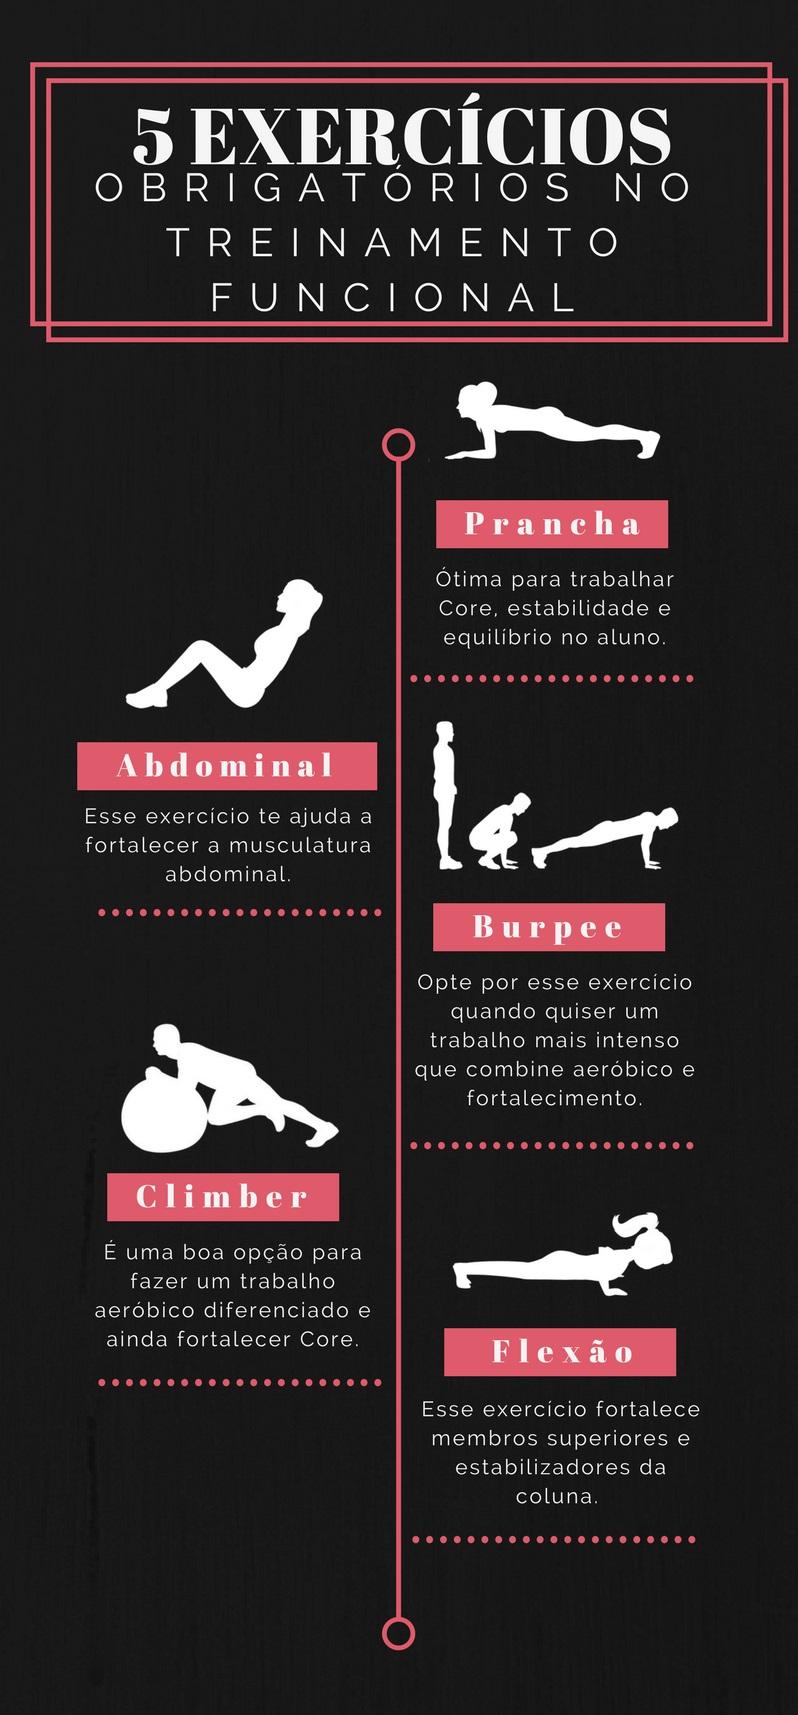 5-exercicios-funcionais-obrigatorios-na-sua-aula